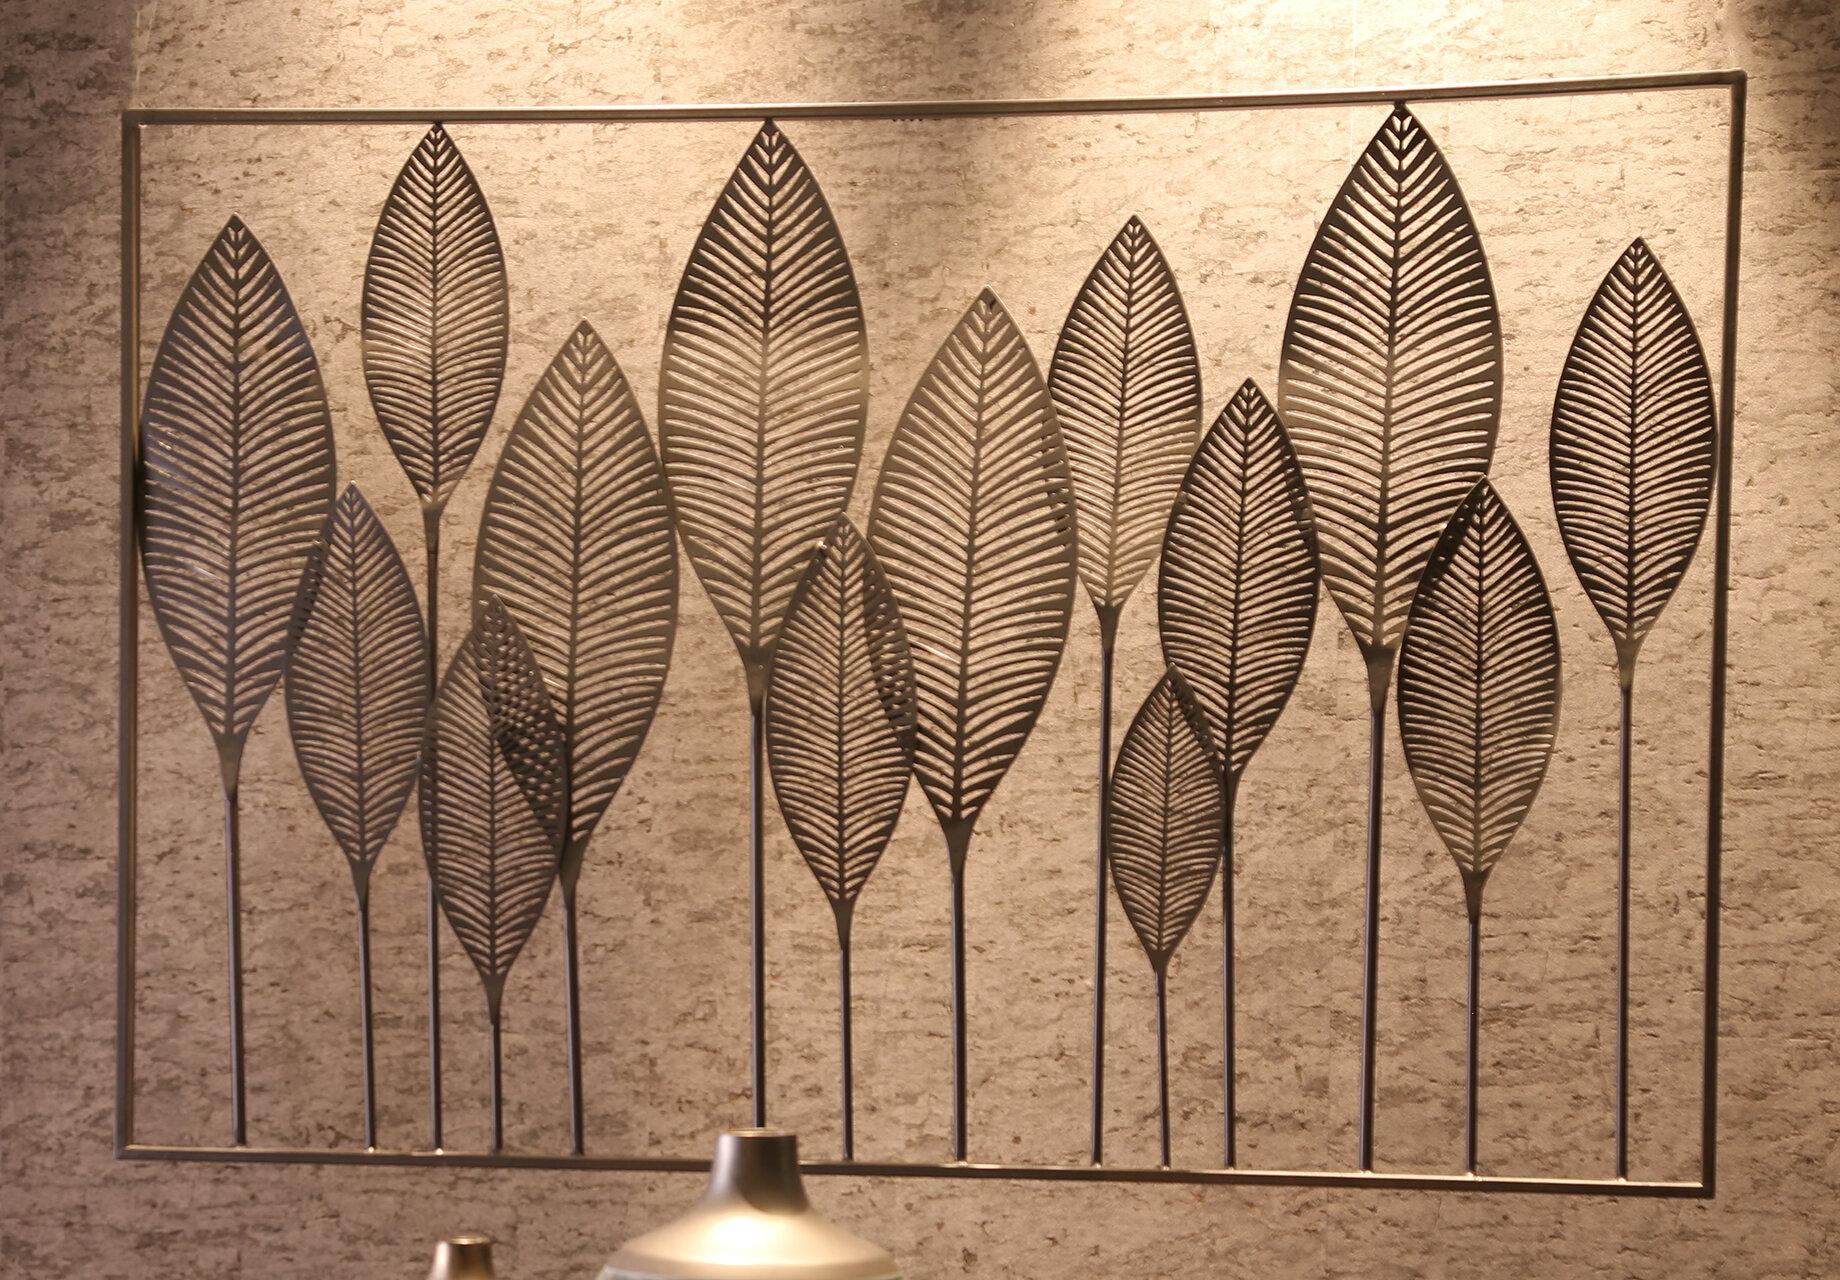 Red Barrel Studio Metal Leaves Wall Décor & Reviews | Wayfair